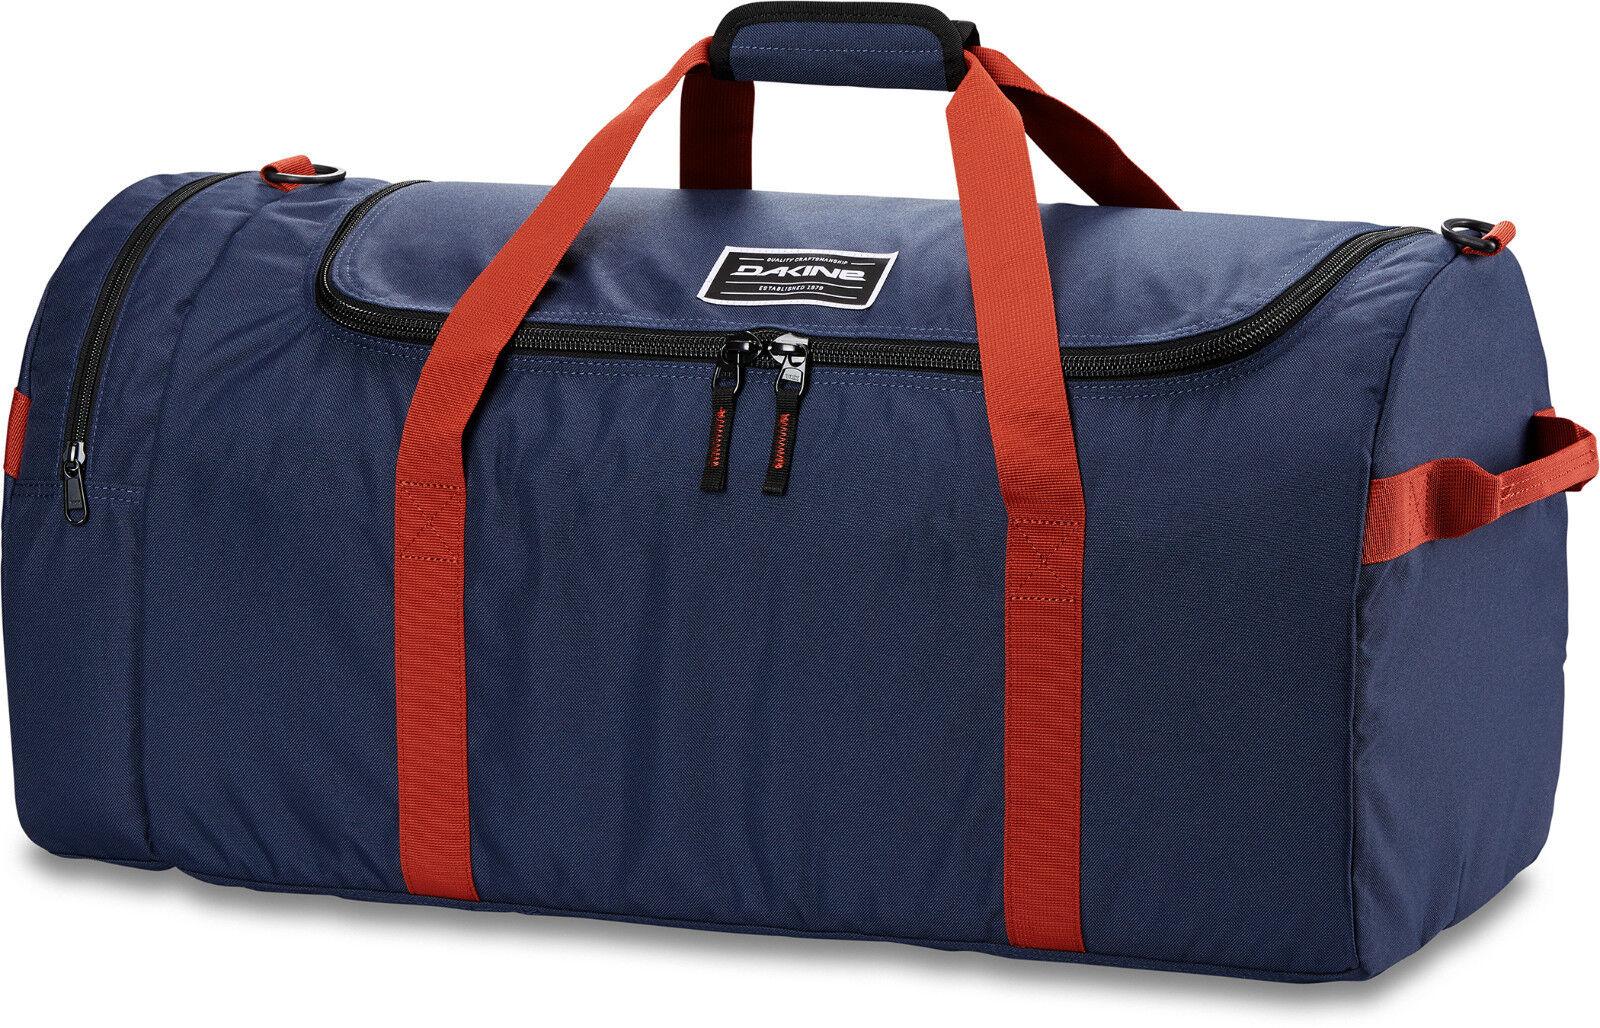 Dakine EQ Bag Large Sac De Sport Sac de voyage Dark Navy NEUF 74 L